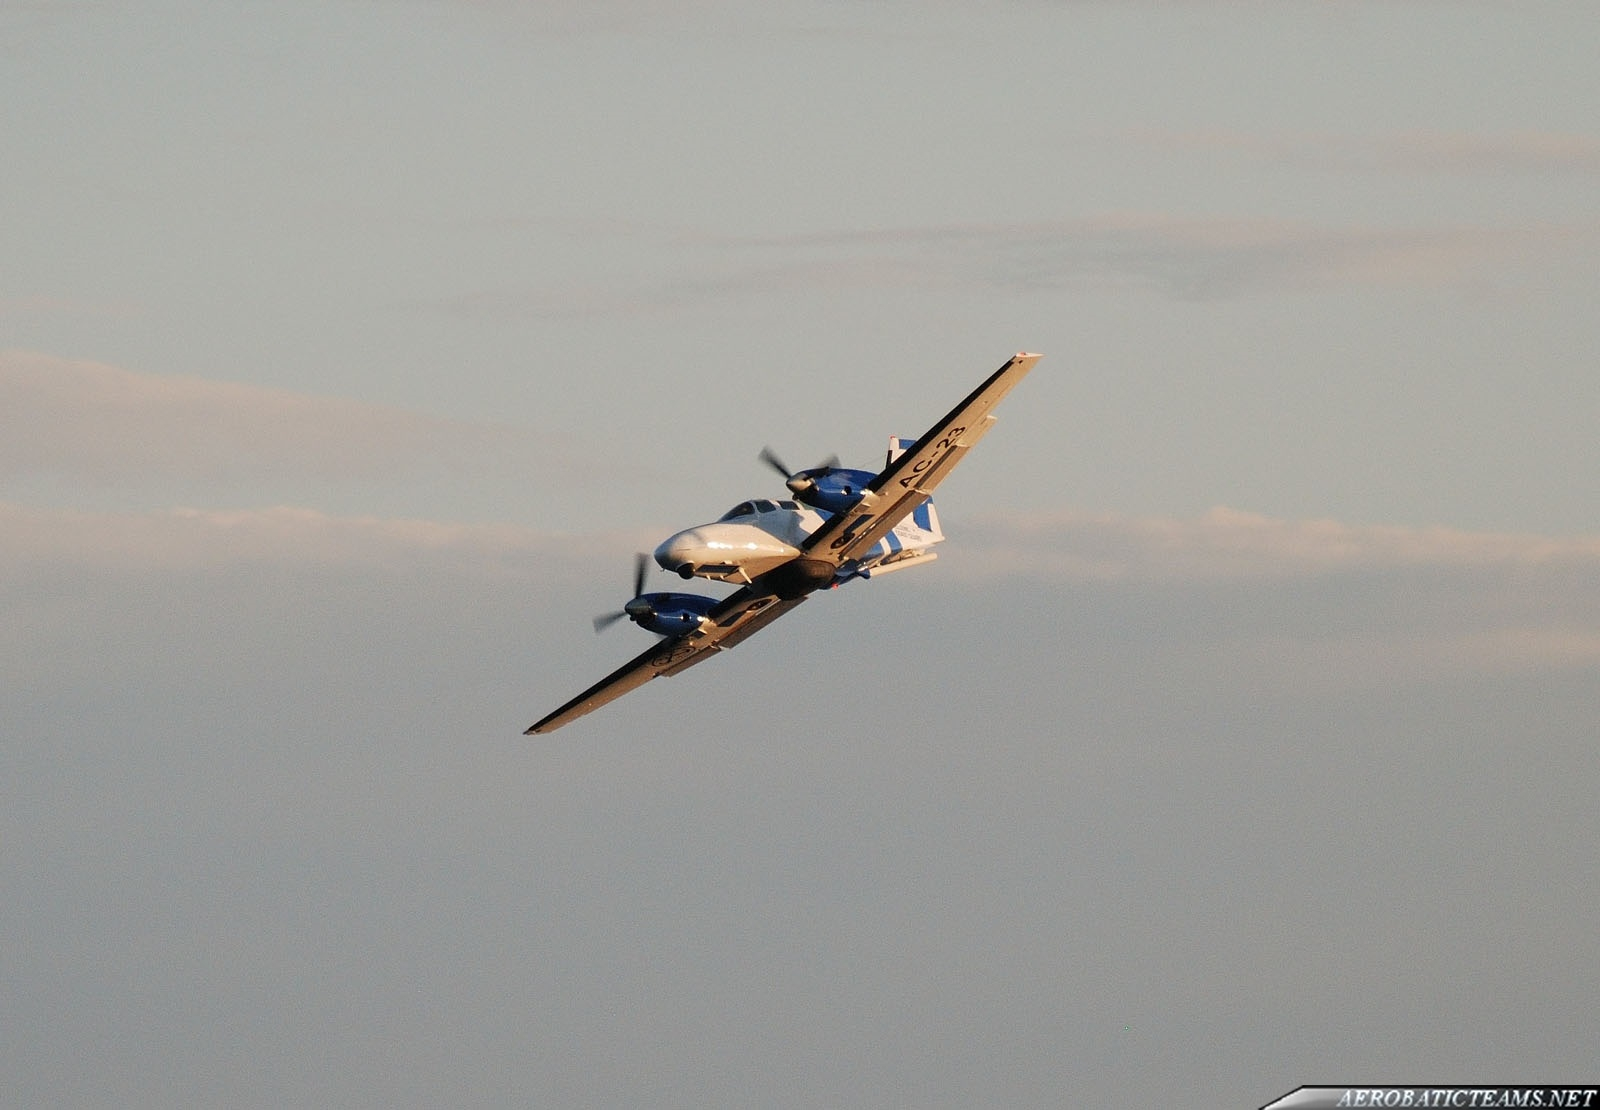 Hellenic Coast Guard F-406